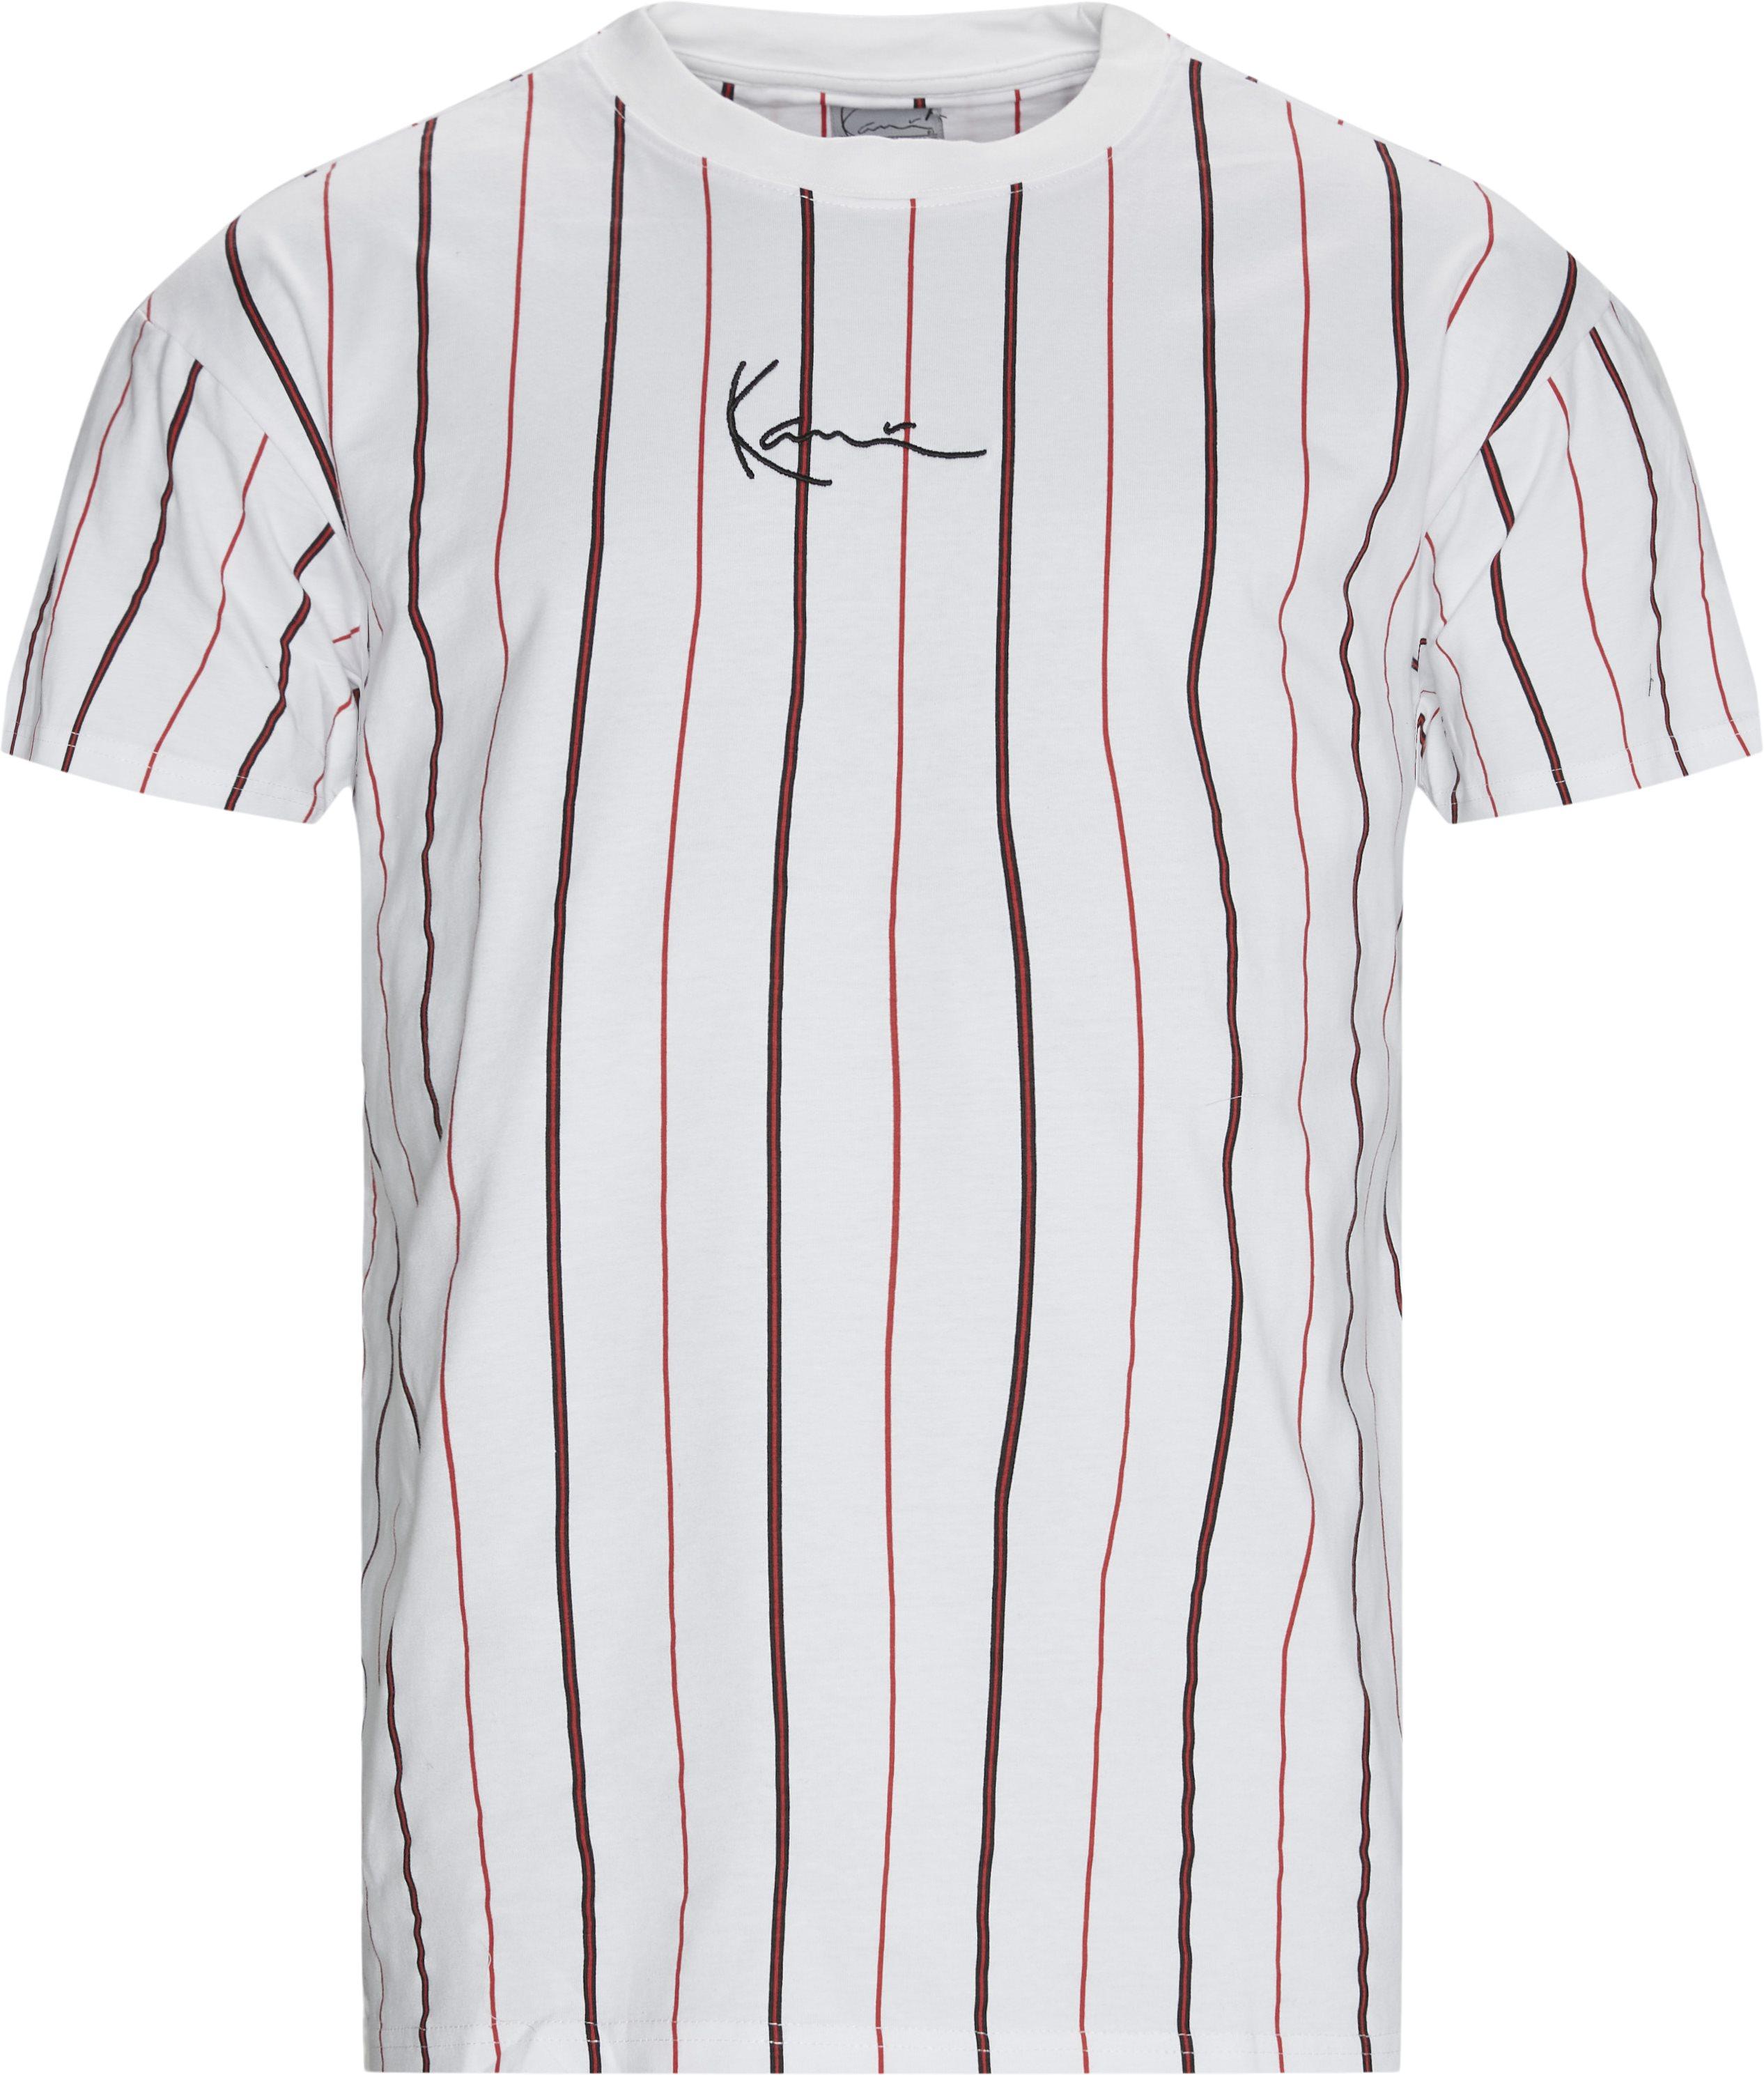 Small Signature Pinstripe T-shirt - T-shirts - Regular - Hvid